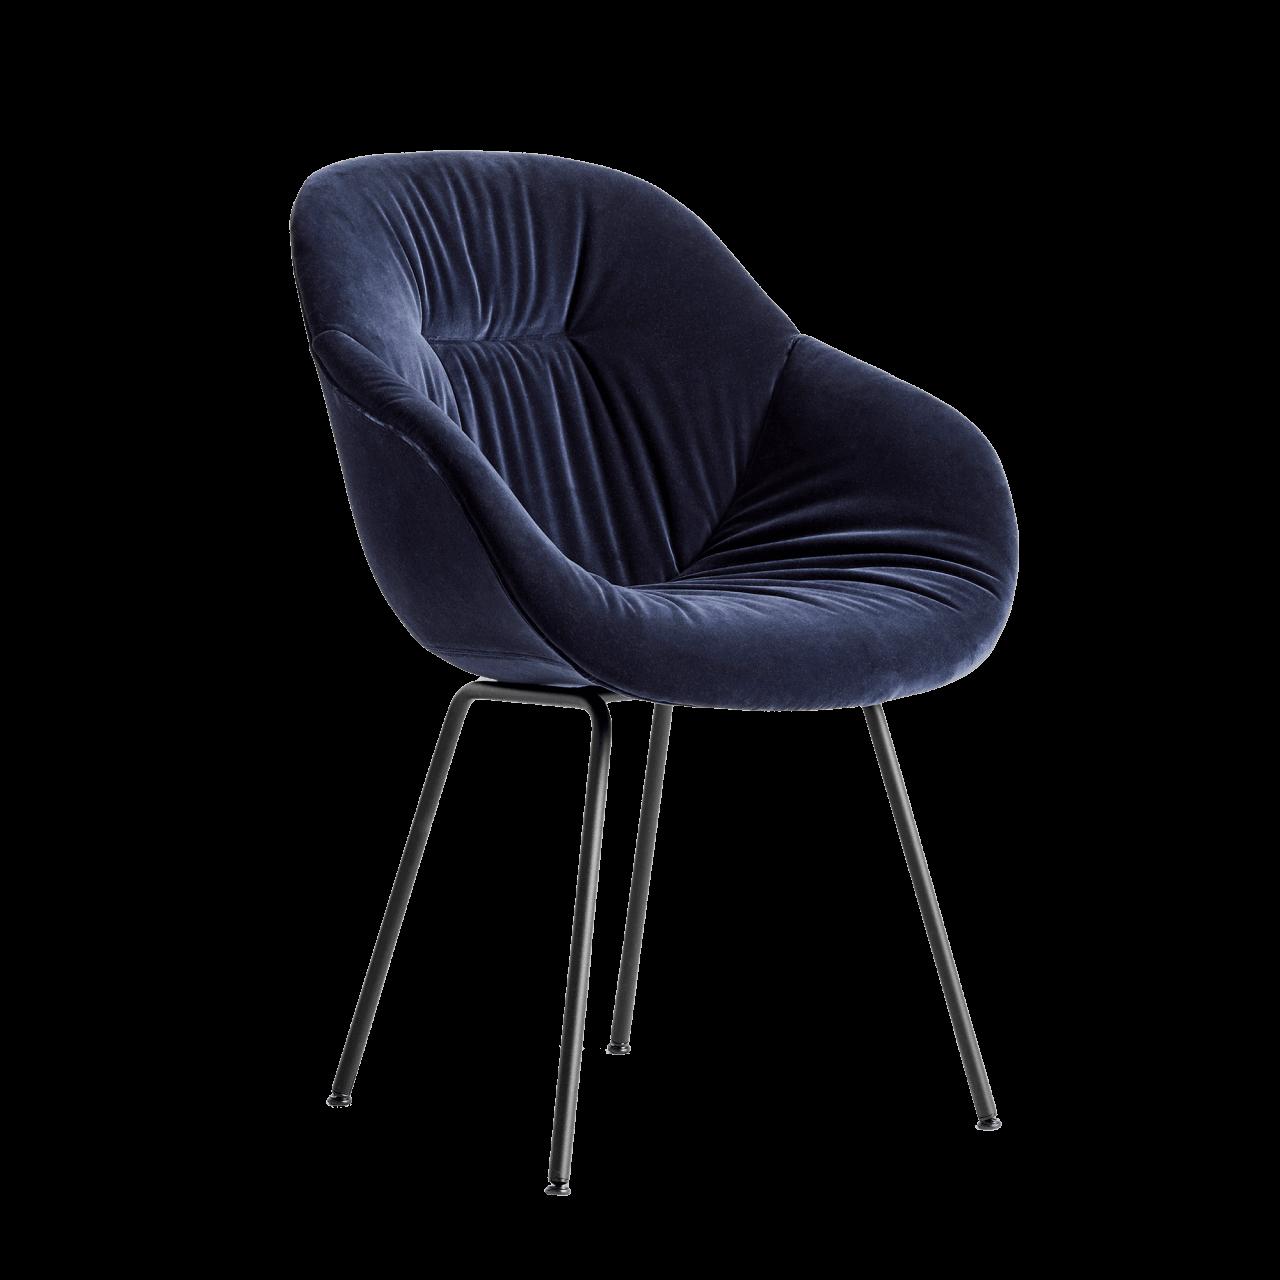 About A Chair 127 Soft Armlehnstuhl